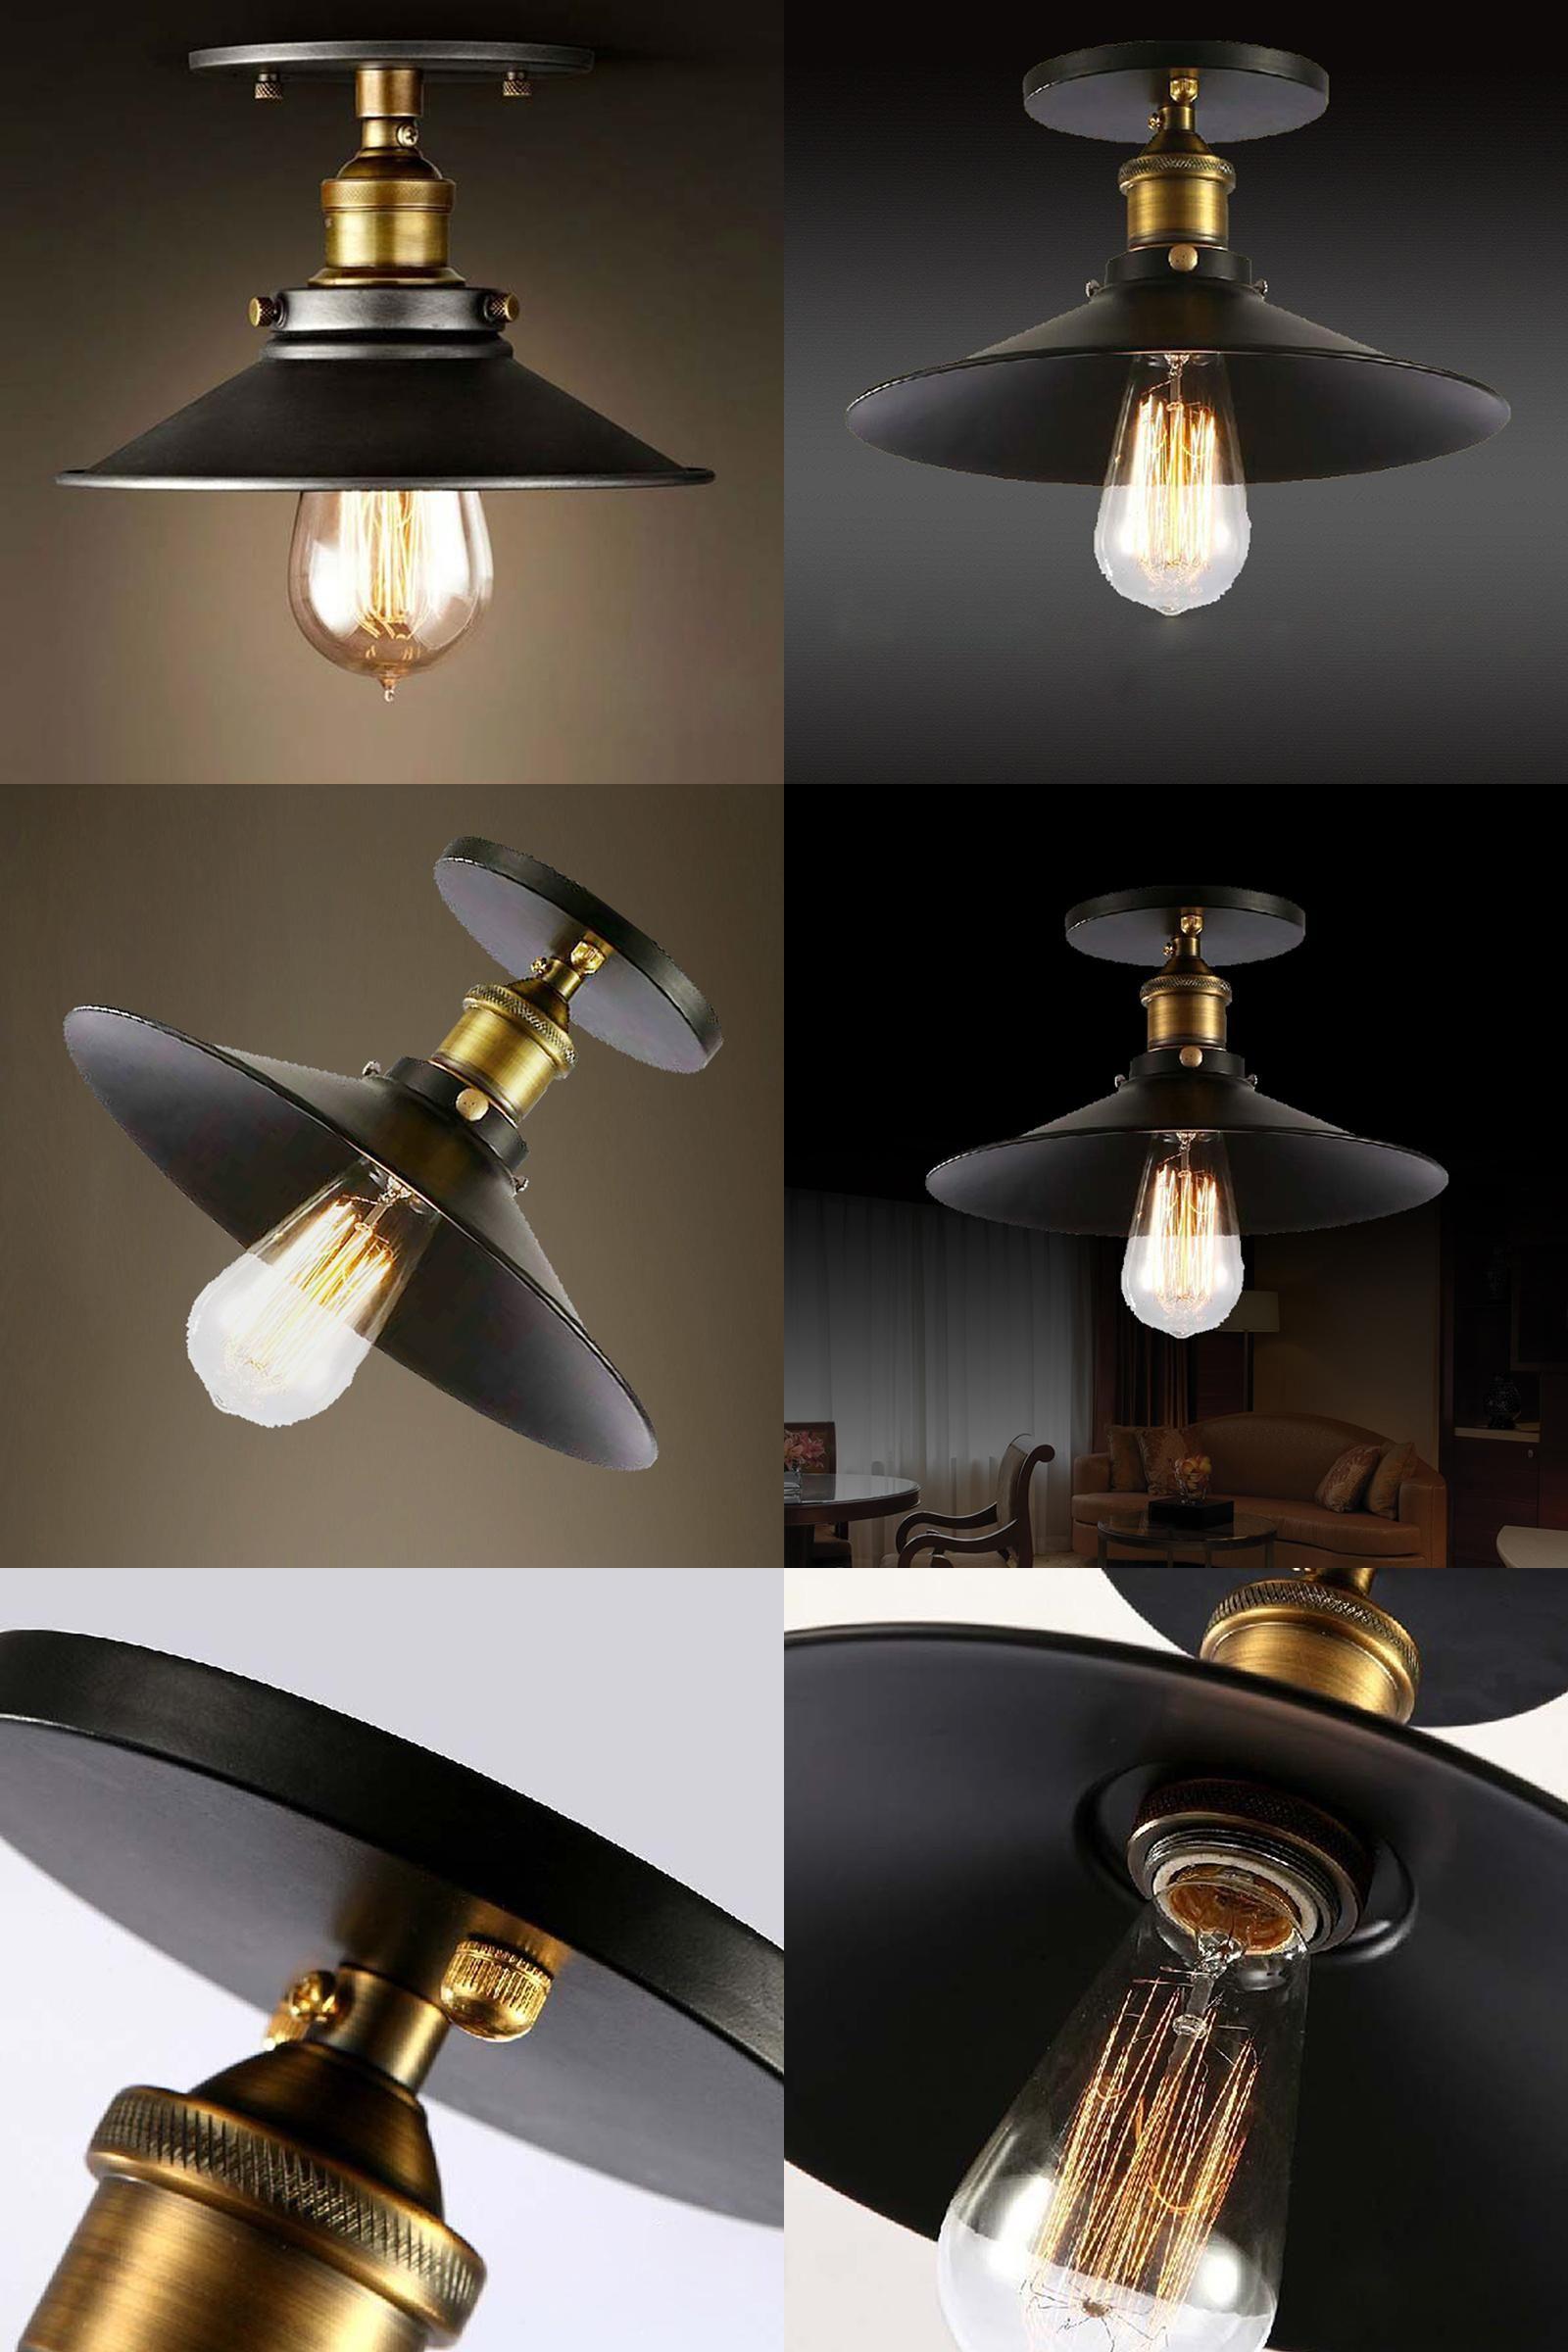 9f1e060e4e1  Visit to Buy  Loft Vintage Ceiling Lamp Round Retro Ceiling Light  Industrial Design Edison